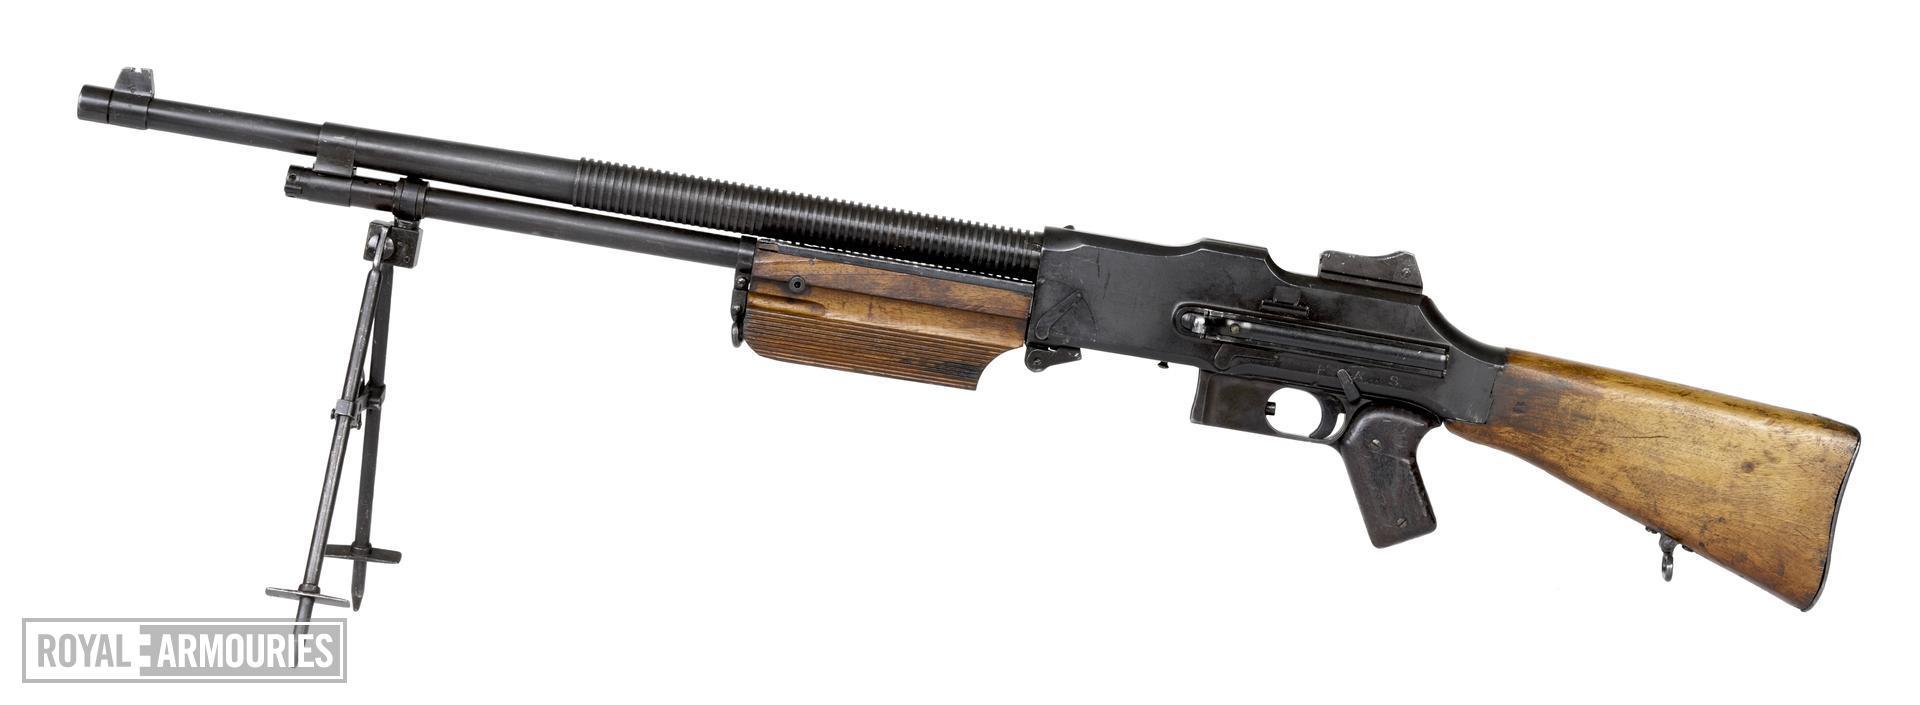 Centrefire automatic light machine gun - Browning Model 1925